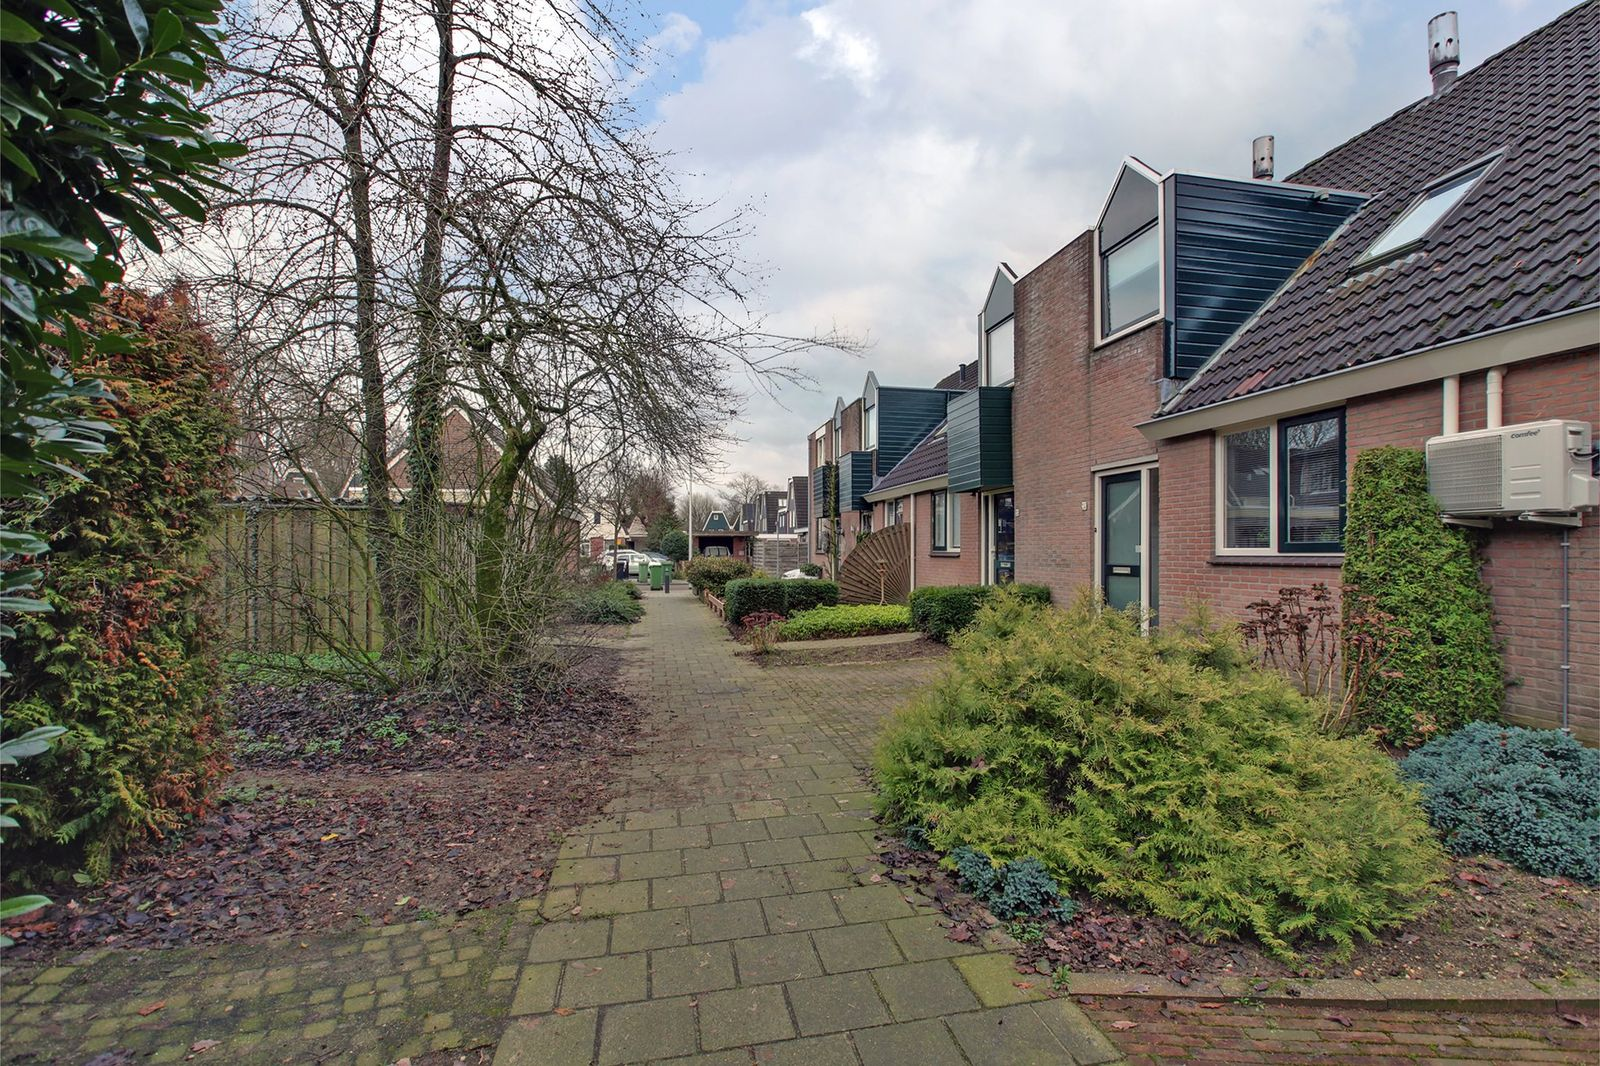 Willem Dreeslaan 255, Epe